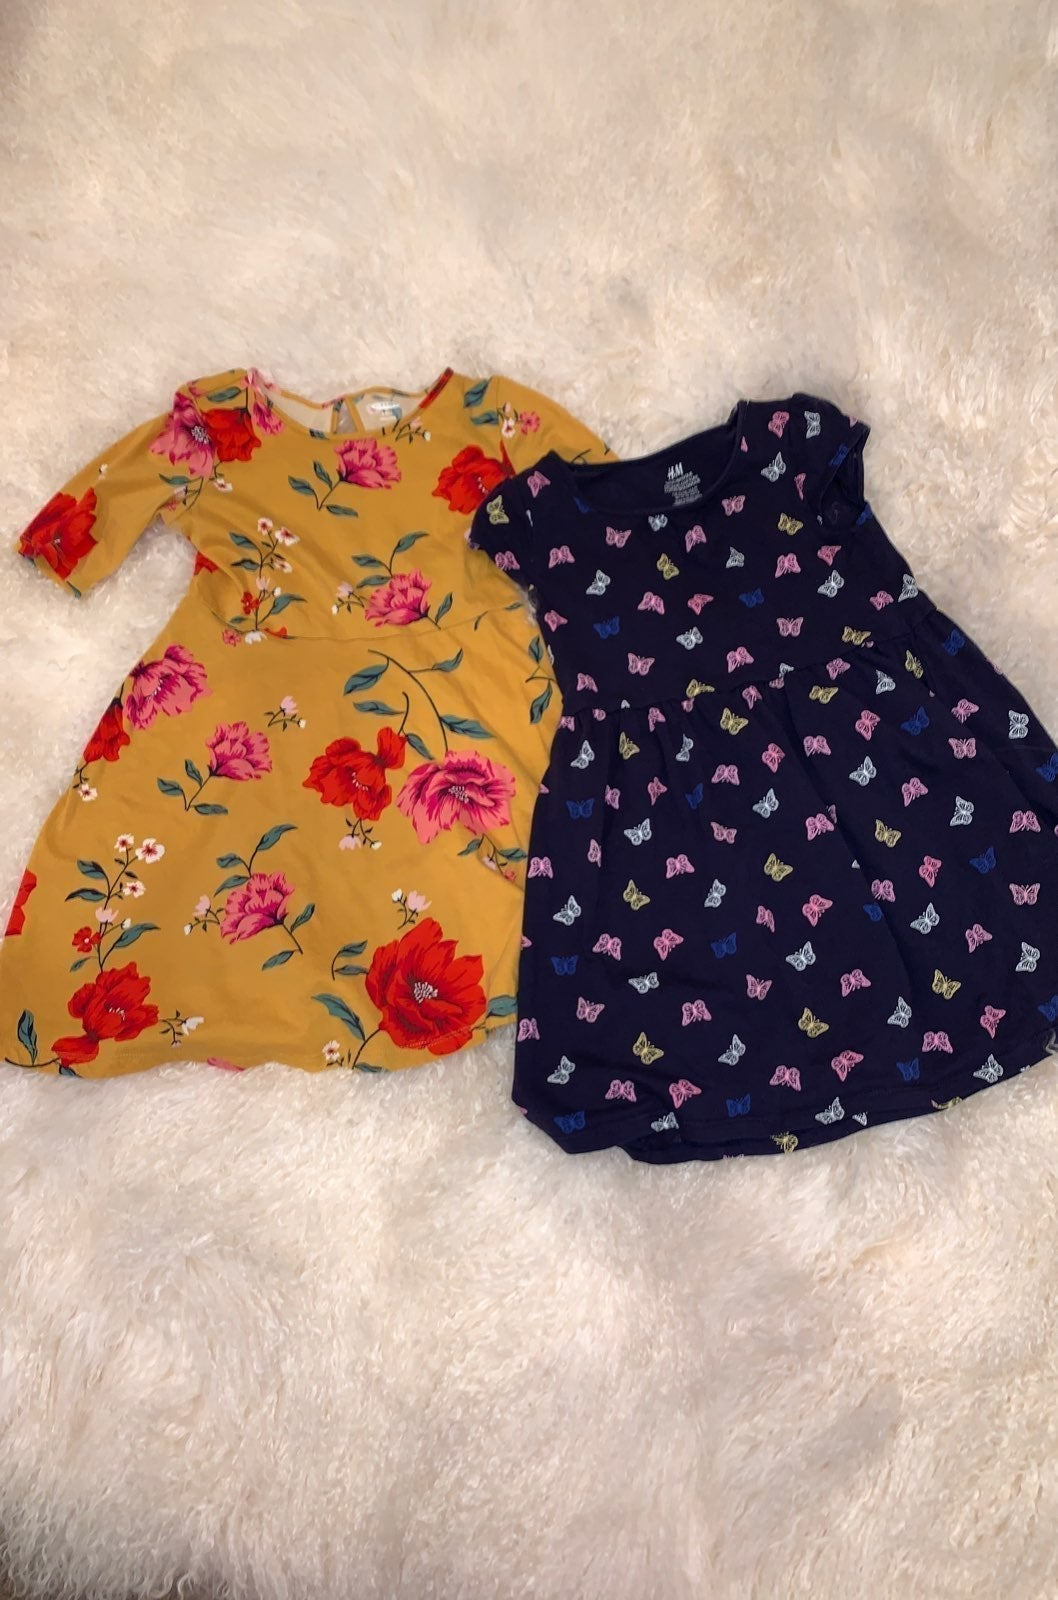 Old navy dresses girls